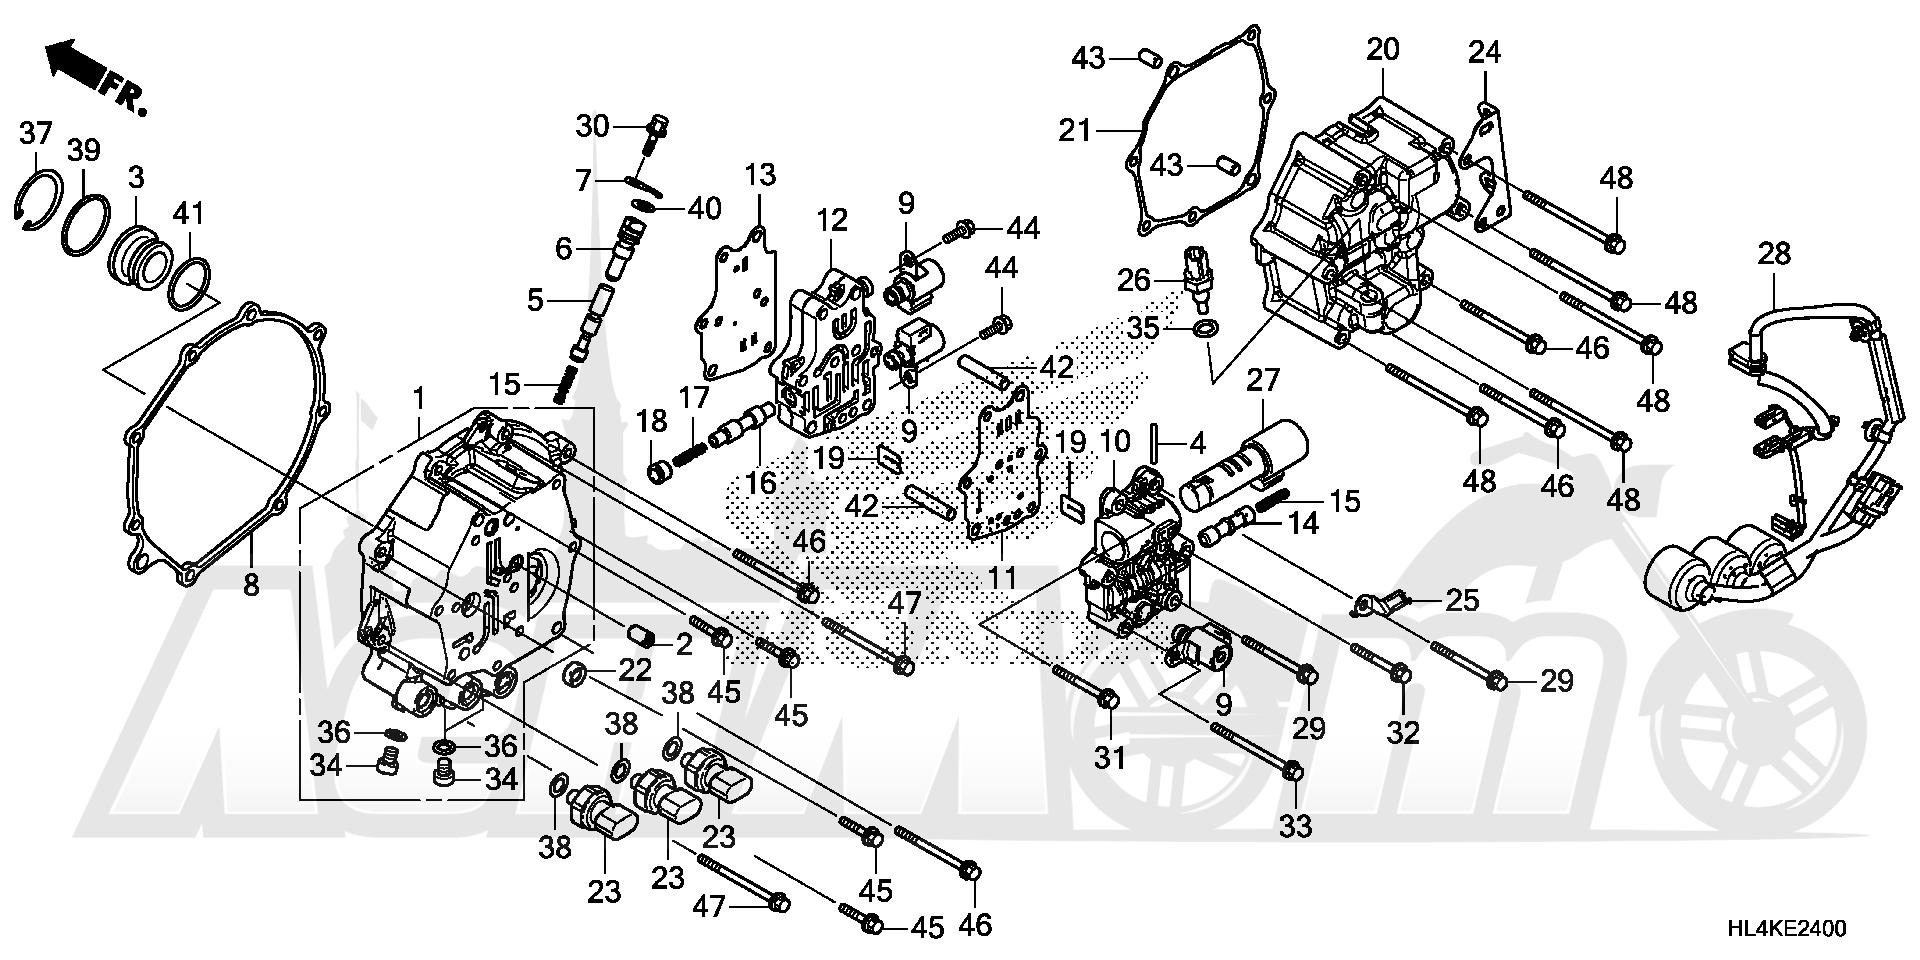 Запчасти для Квадроцикла Honda 2019 SXS1000M3L Раздел: SOLENOID VALVE | реле, соленоид клапан